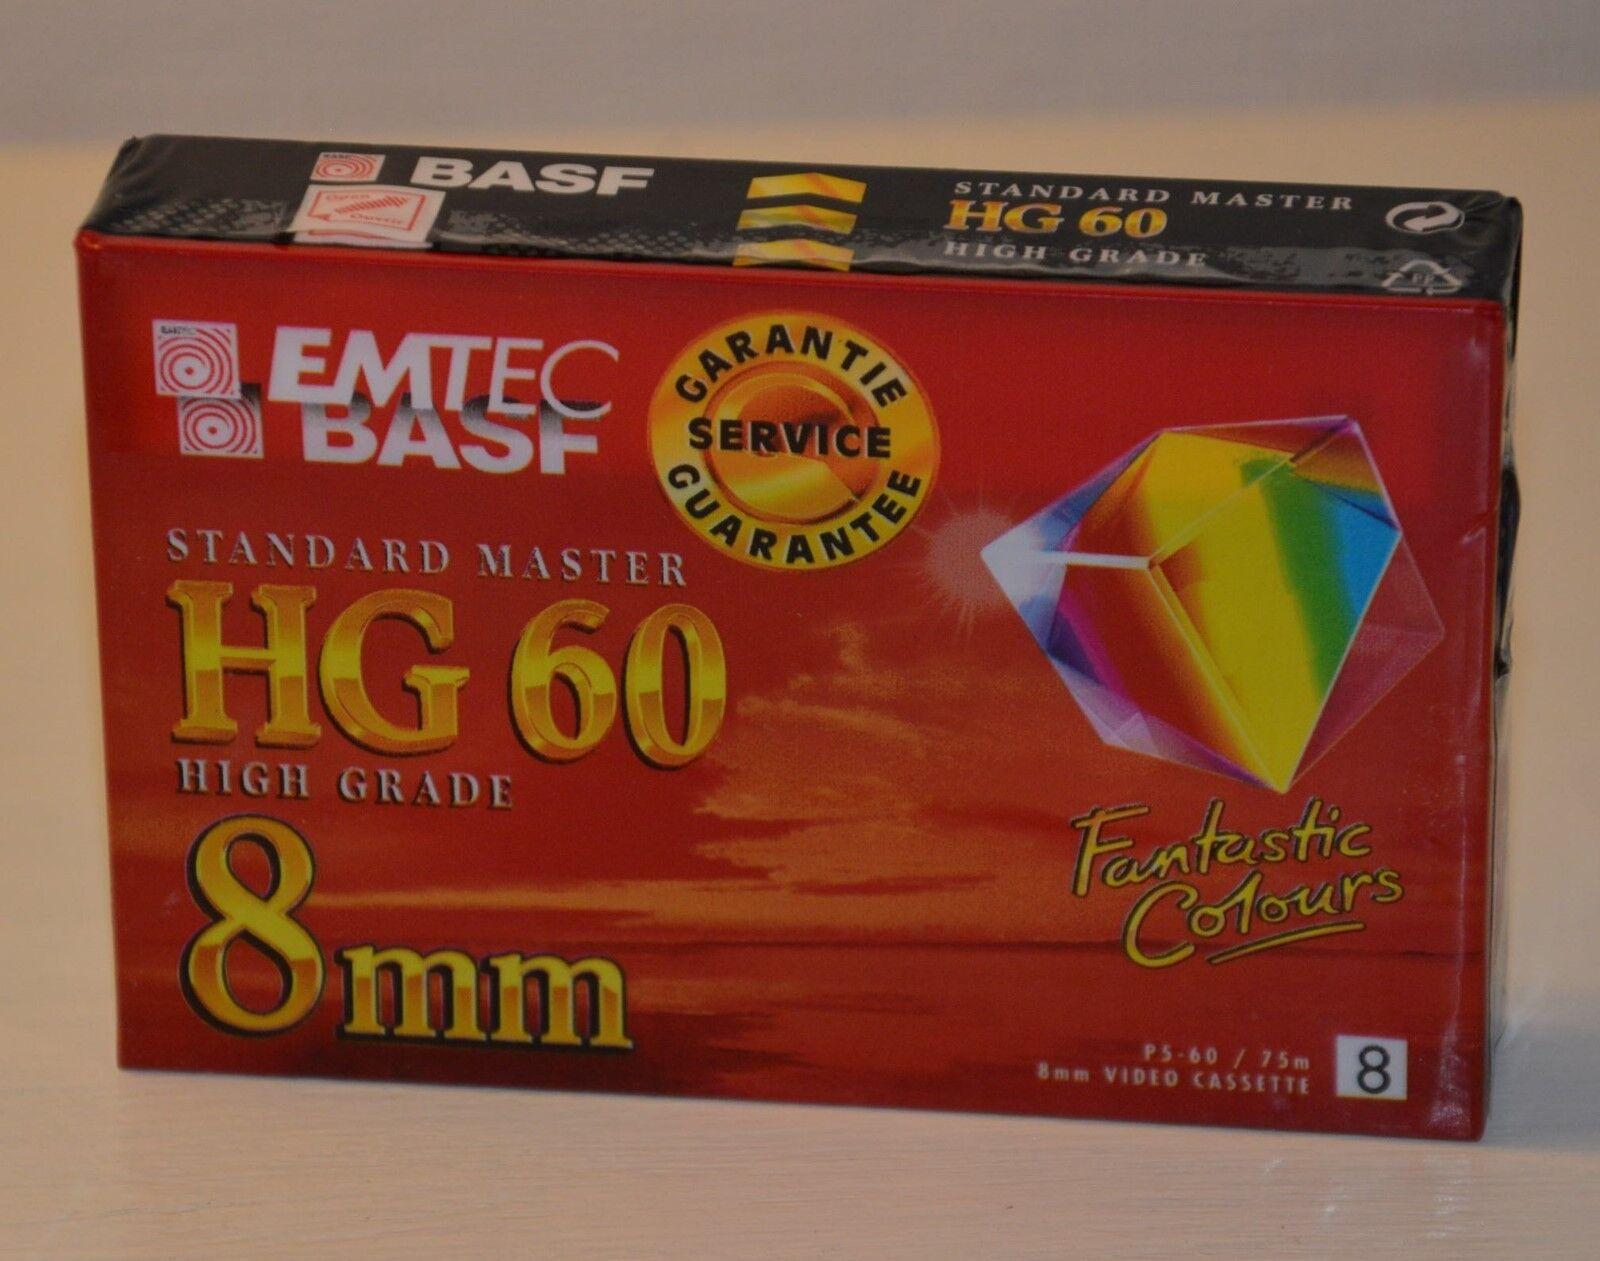 K7 video tape hg 60 BASF emtec 8mm standard master high grade virgin new